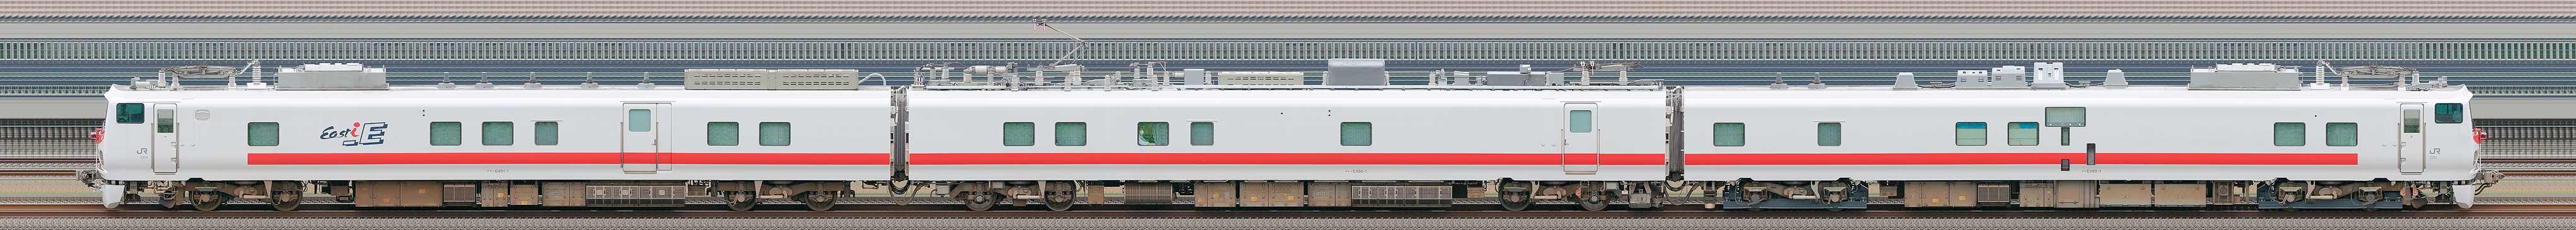 JR東日本E491系電気・軌道総合試験交直流電車「East i-E」(山側)の編成サイドビュー